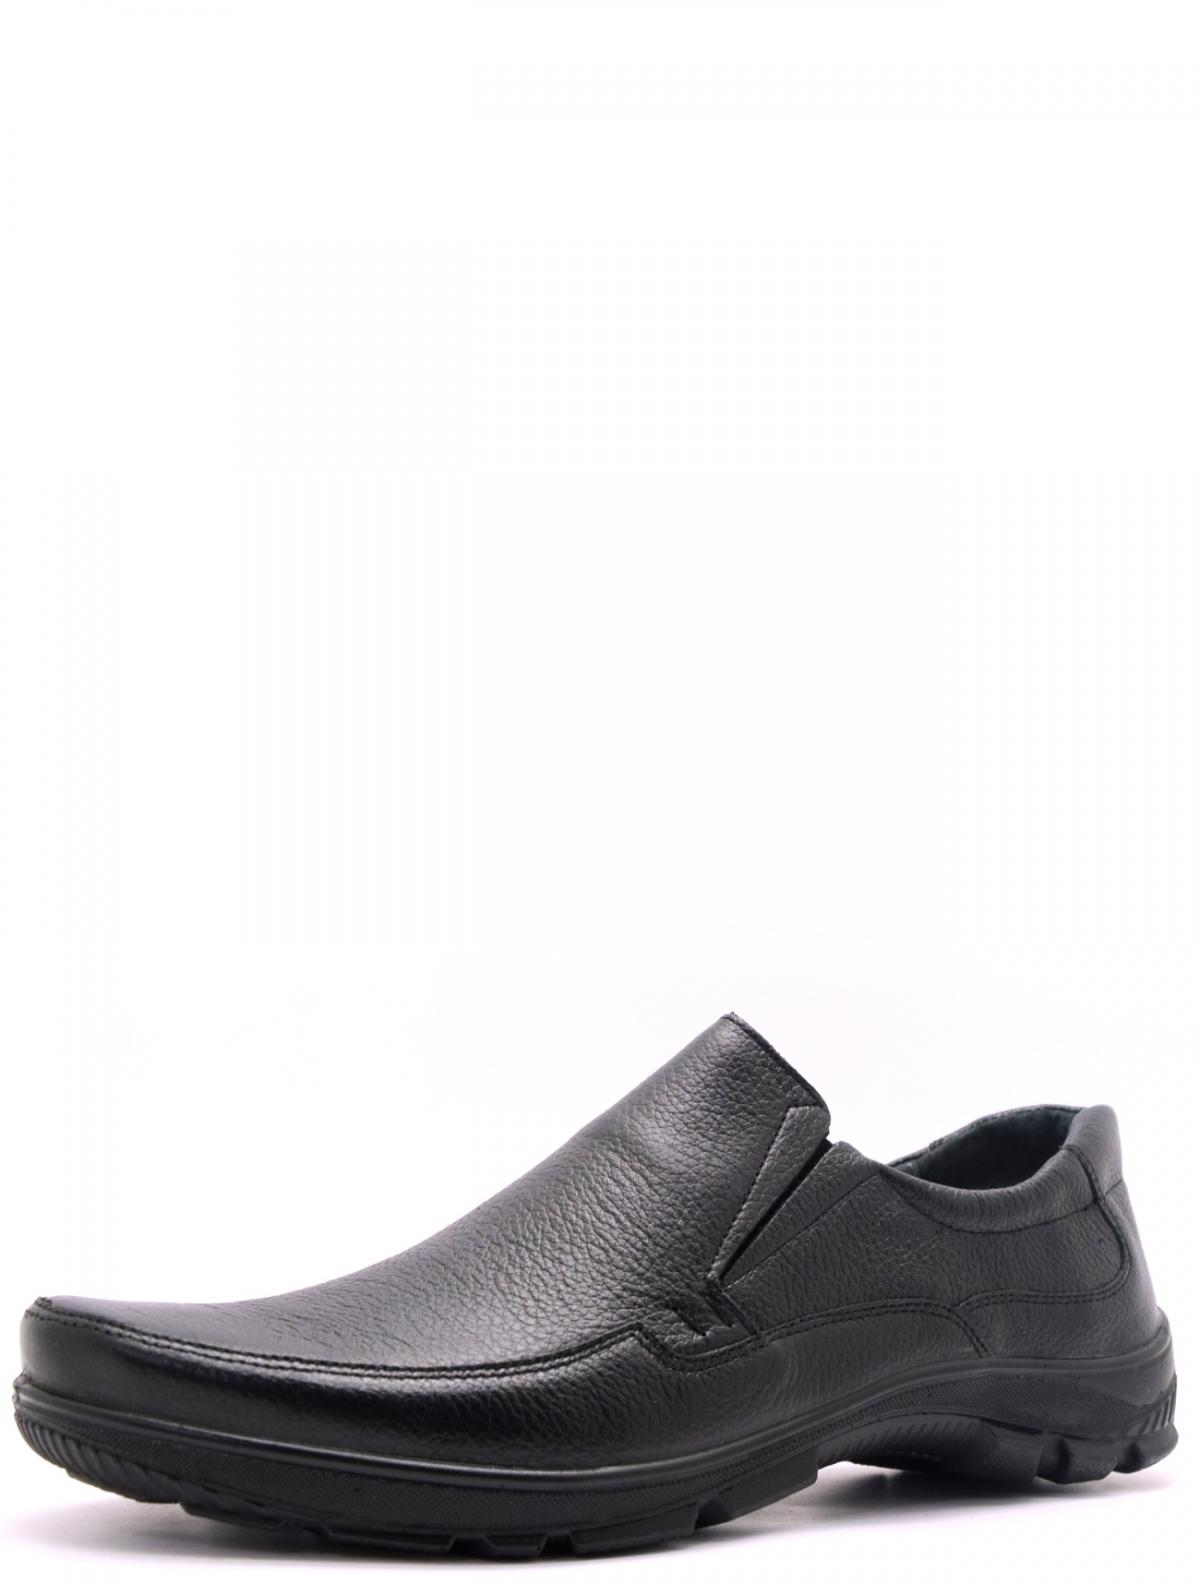 Marko 4772 мужские туфли